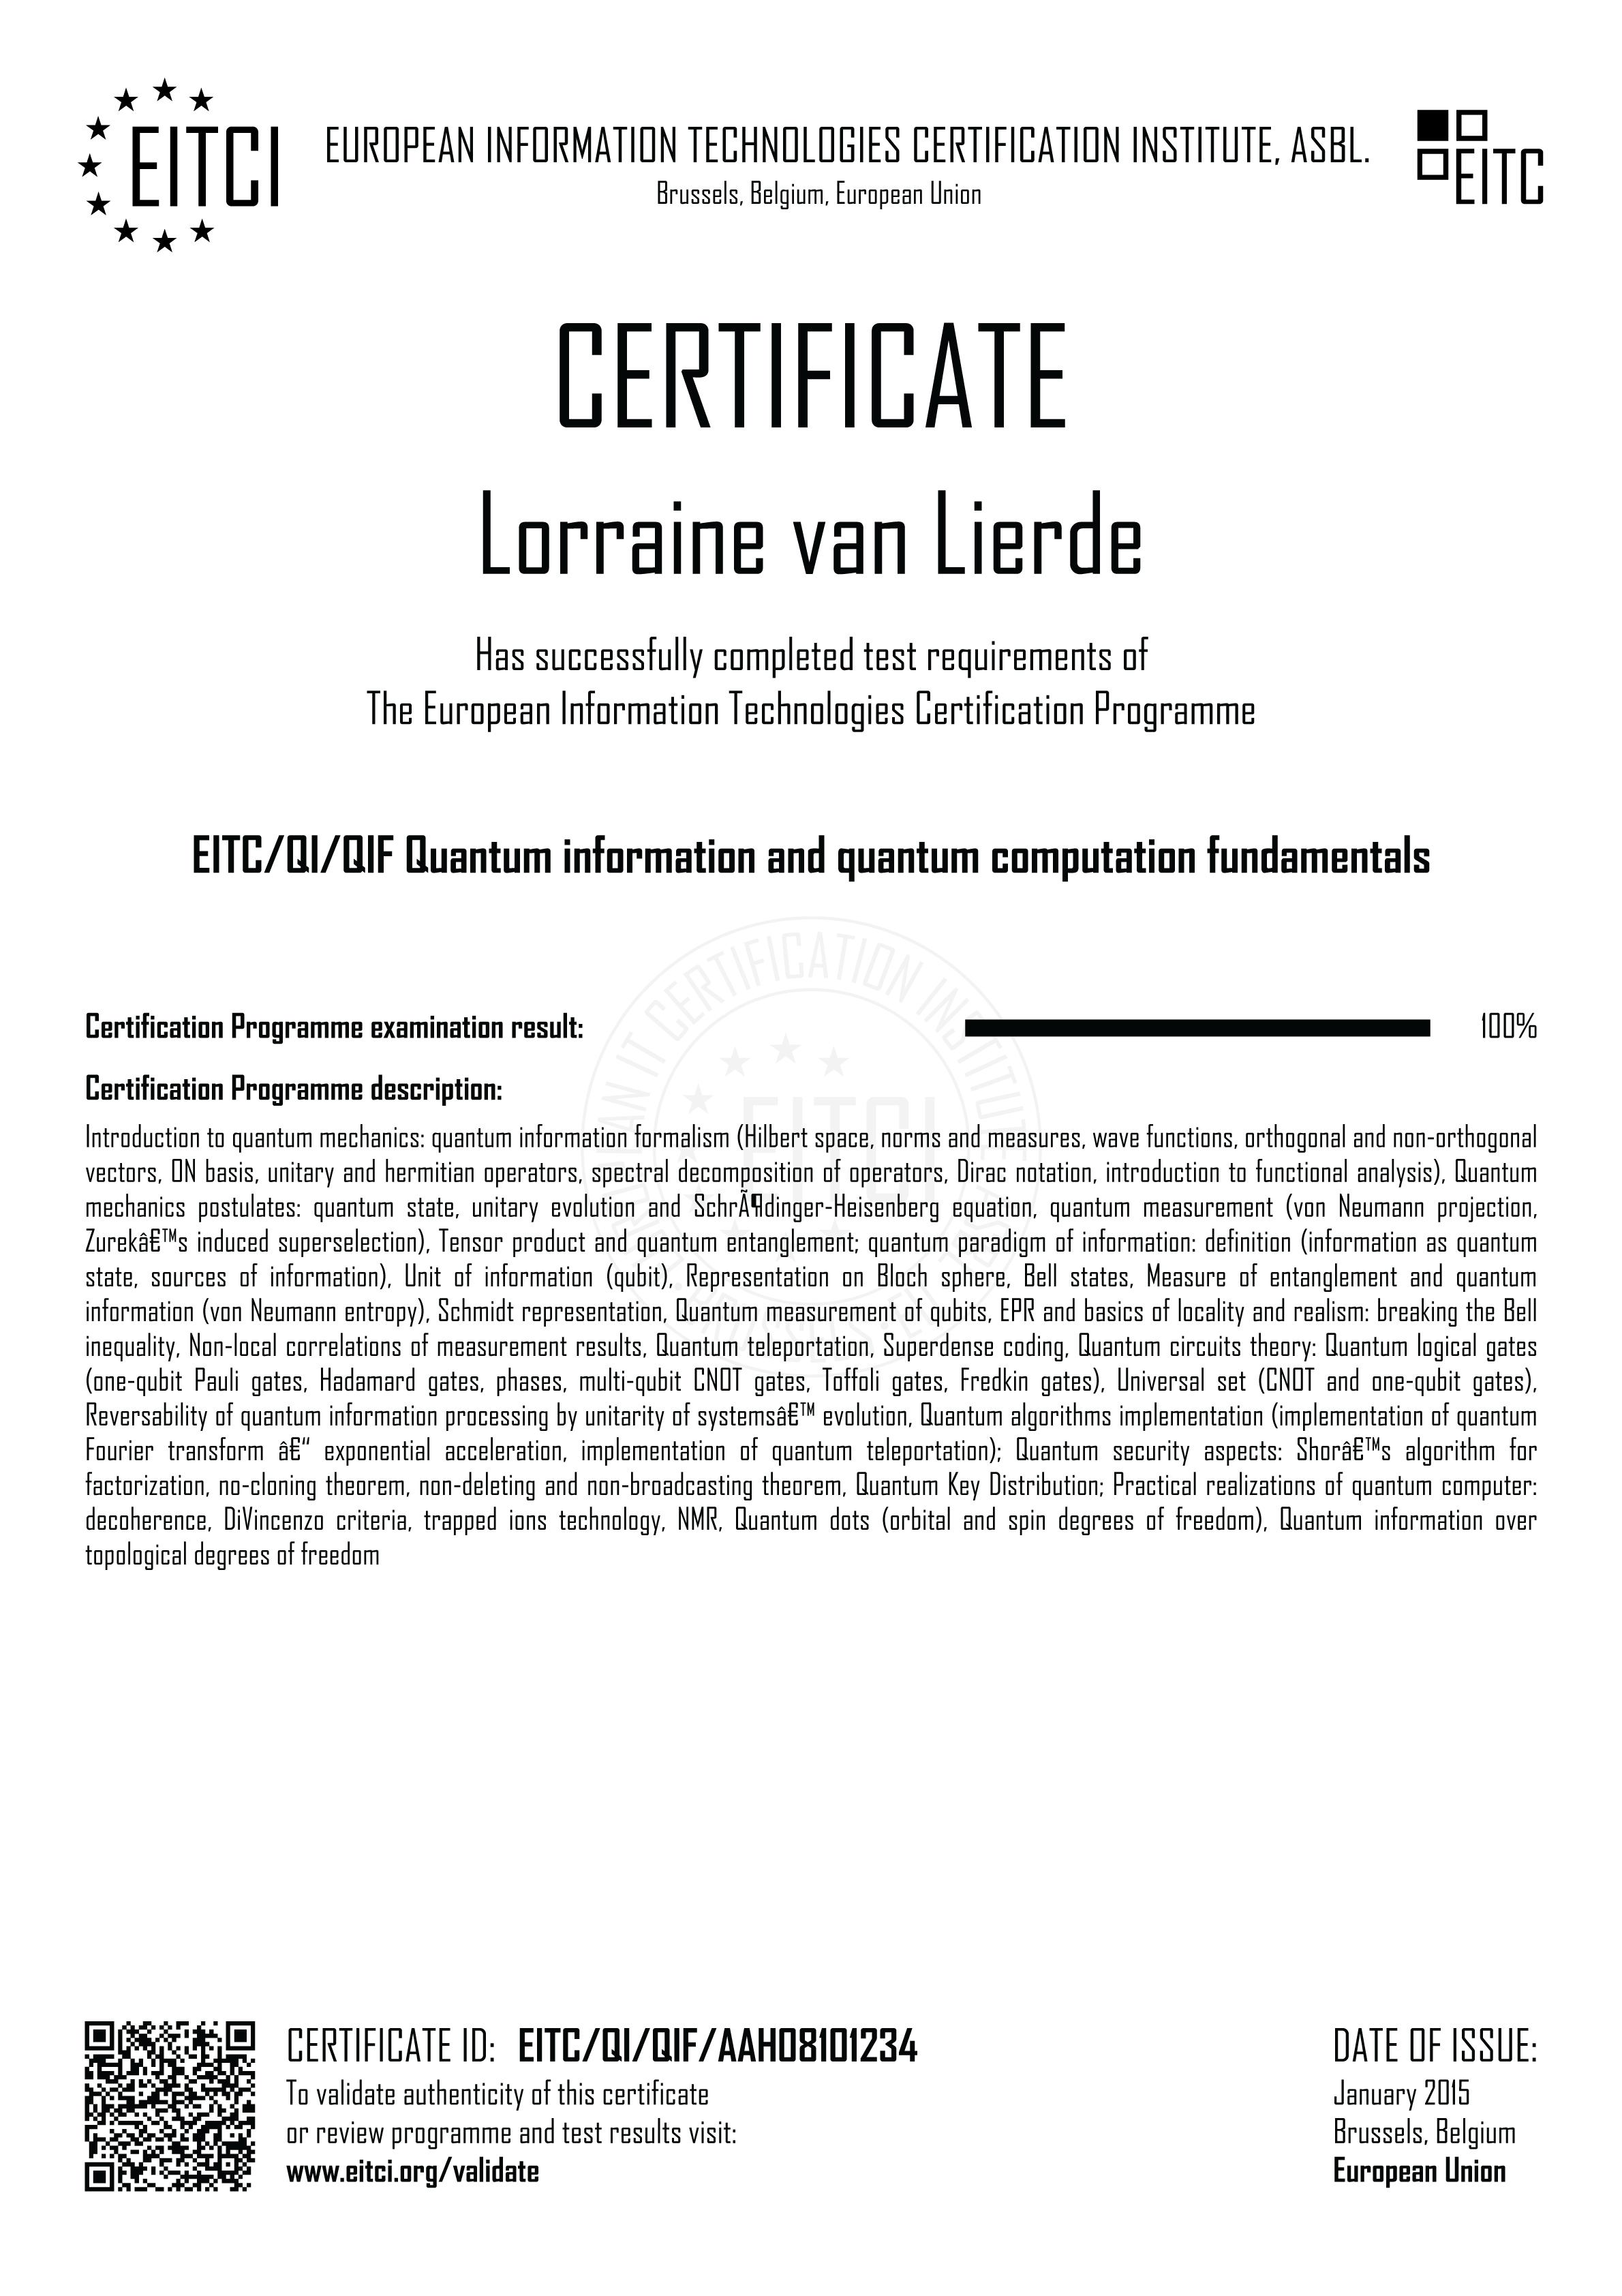 EITC/QI/QIF Quantum information and quantum computation fundamentals